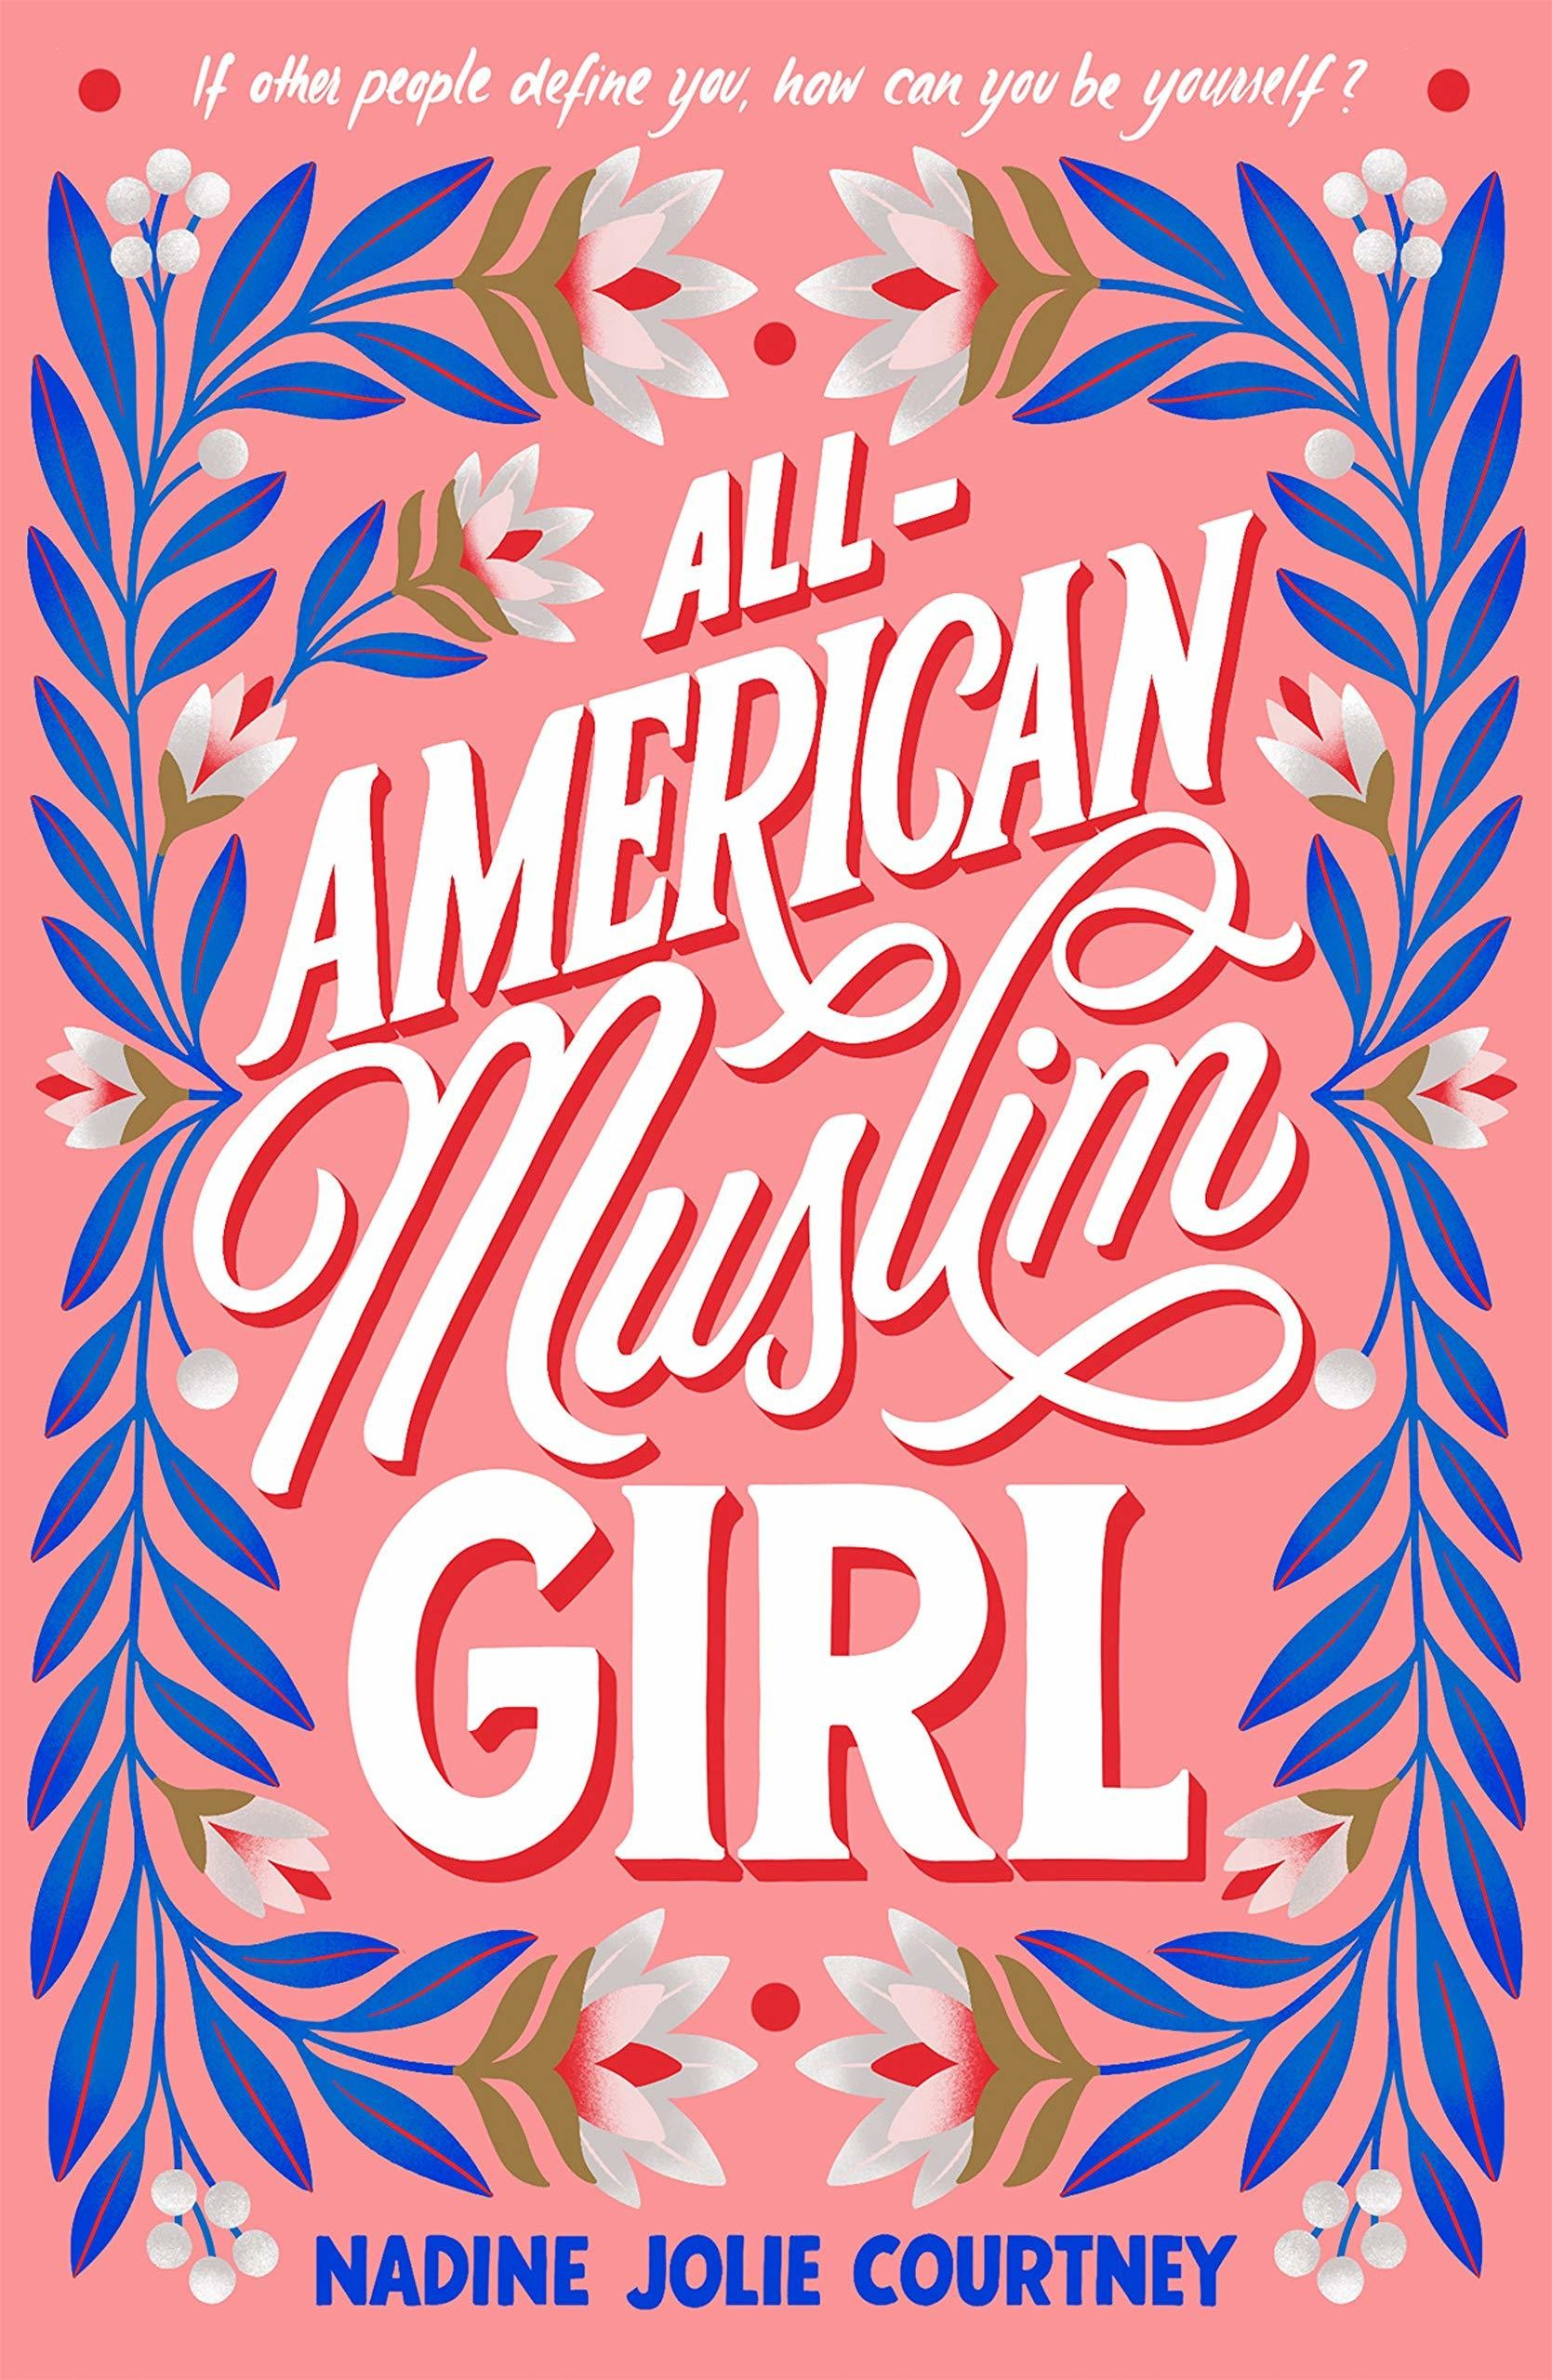 book literature america muslim religion nadine jolie courtney